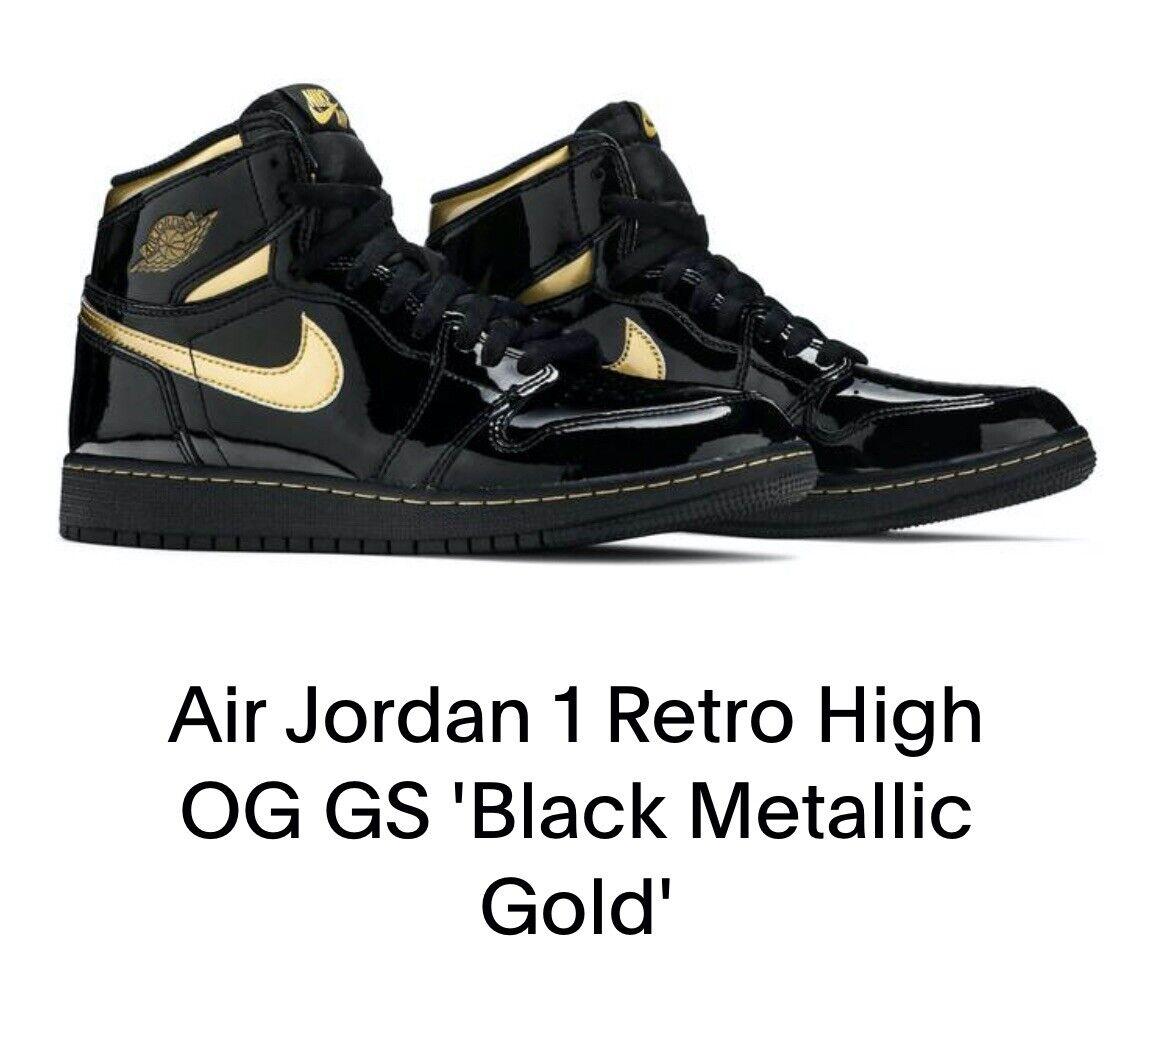 Air Jordan 1 Retro High OG GS 'Black Metallic Gold'